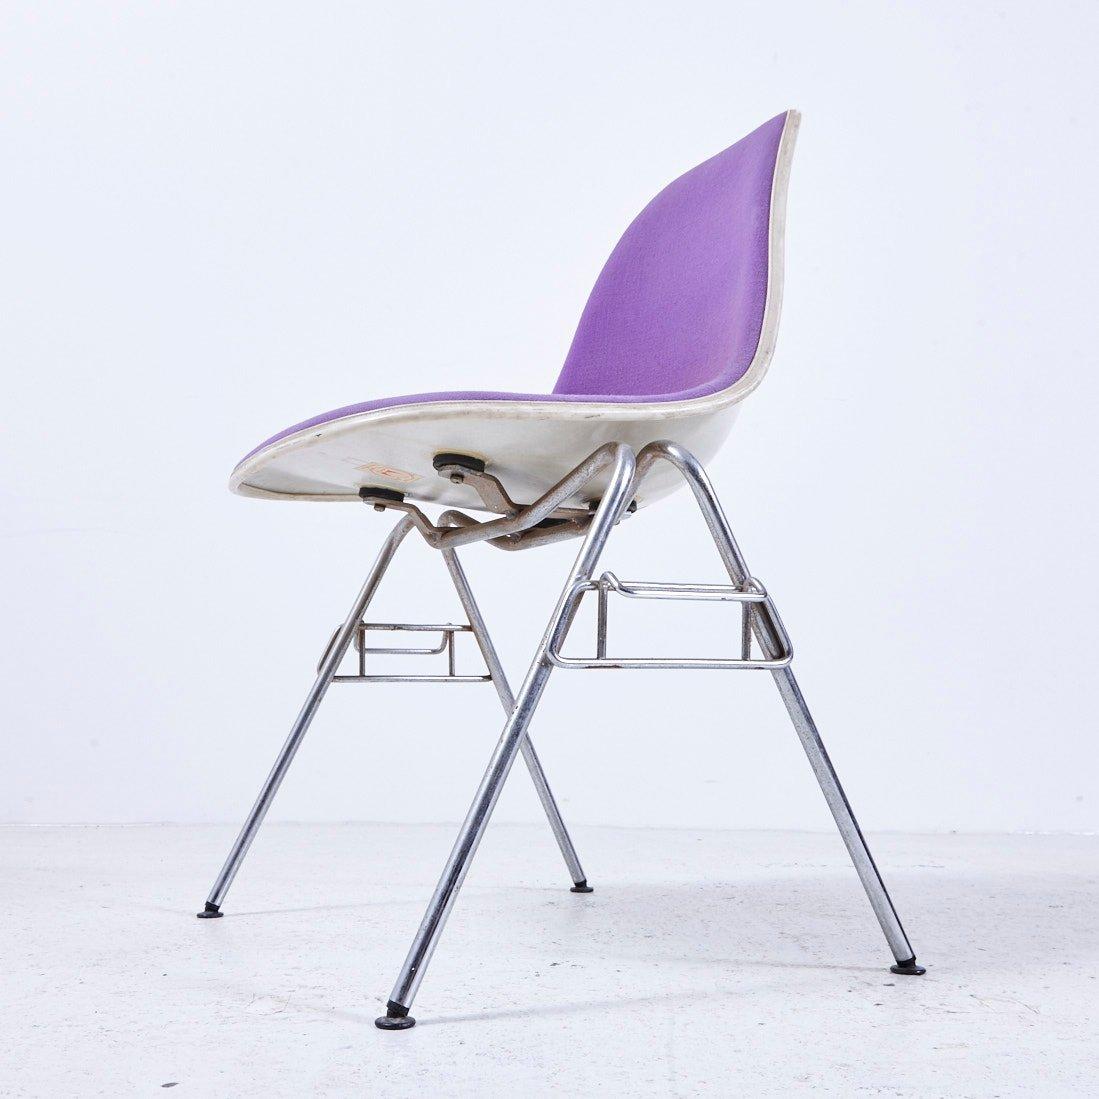 stapelbarer dss n fiberglas stuhl von charles ray eames f r herman miller 1950er bei pamono. Black Bedroom Furniture Sets. Home Design Ideas